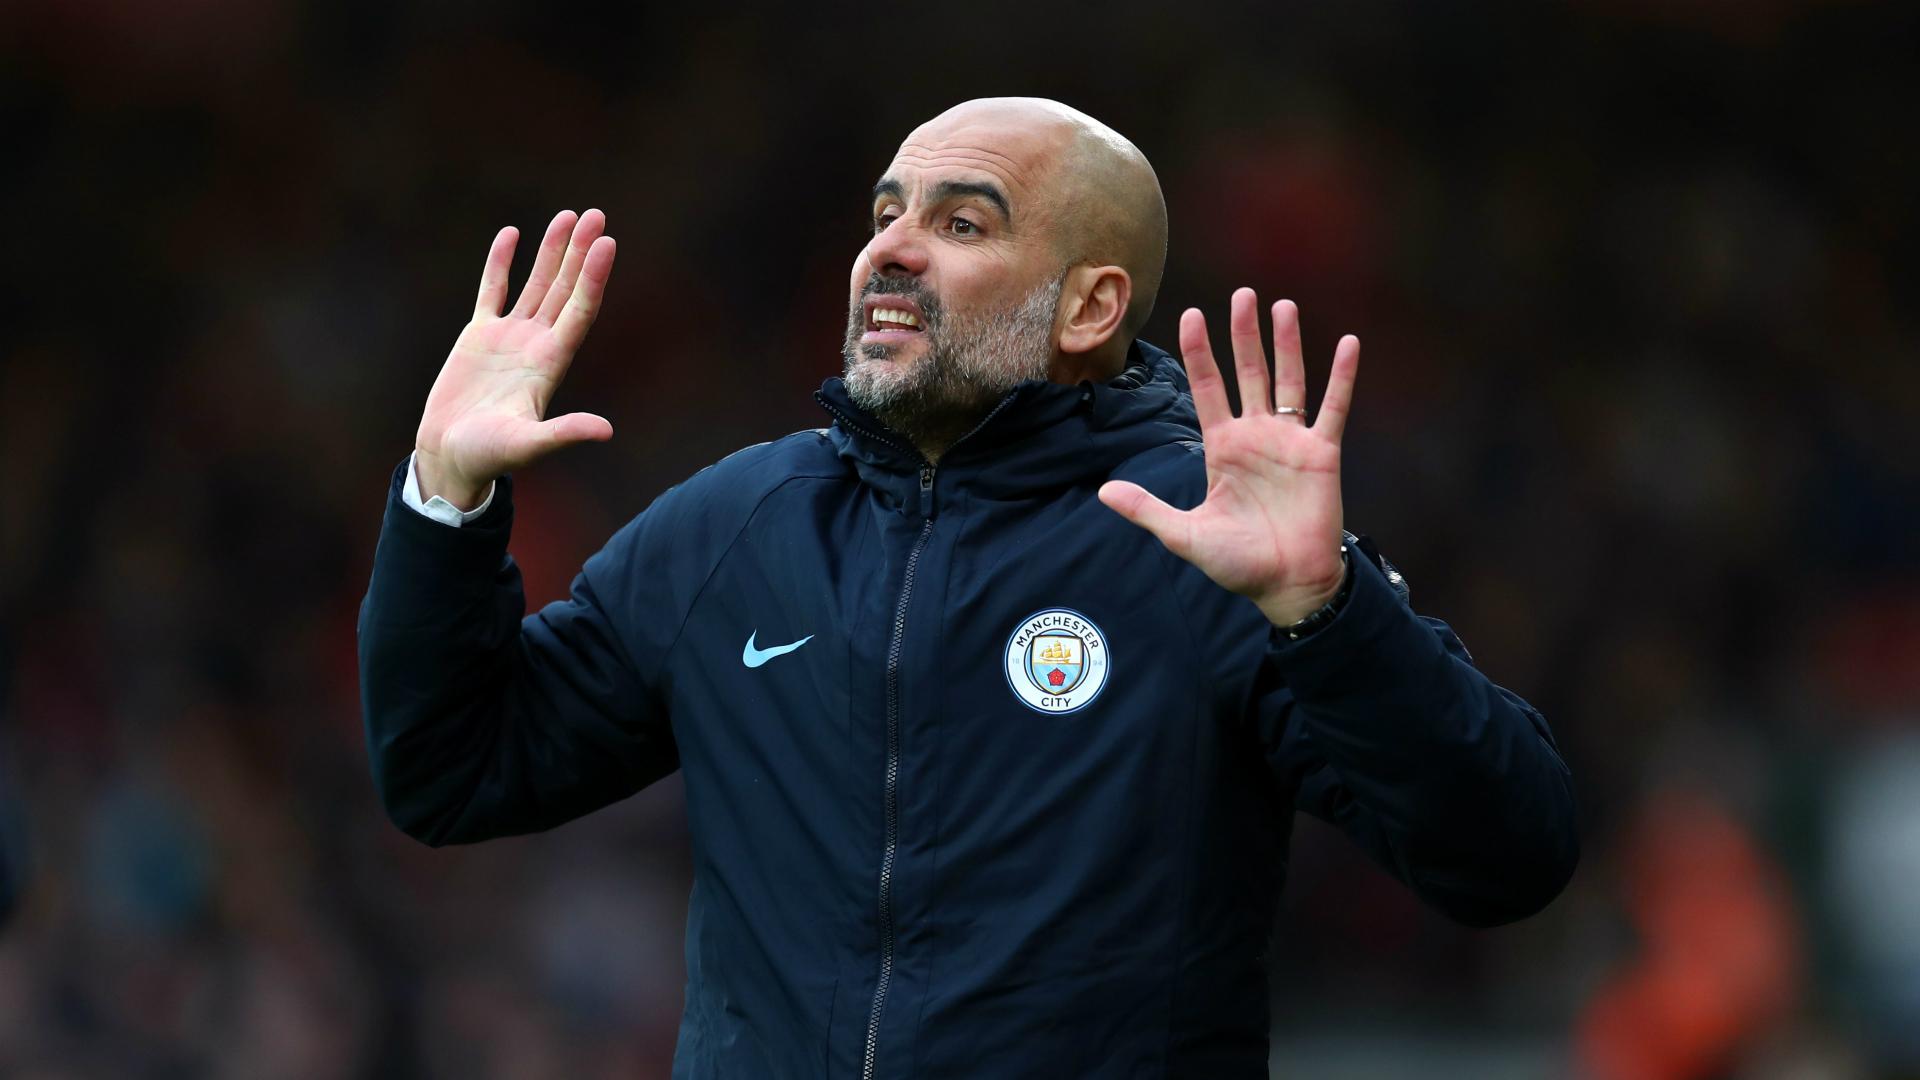 Guardiola rejects Champions League pressure talk